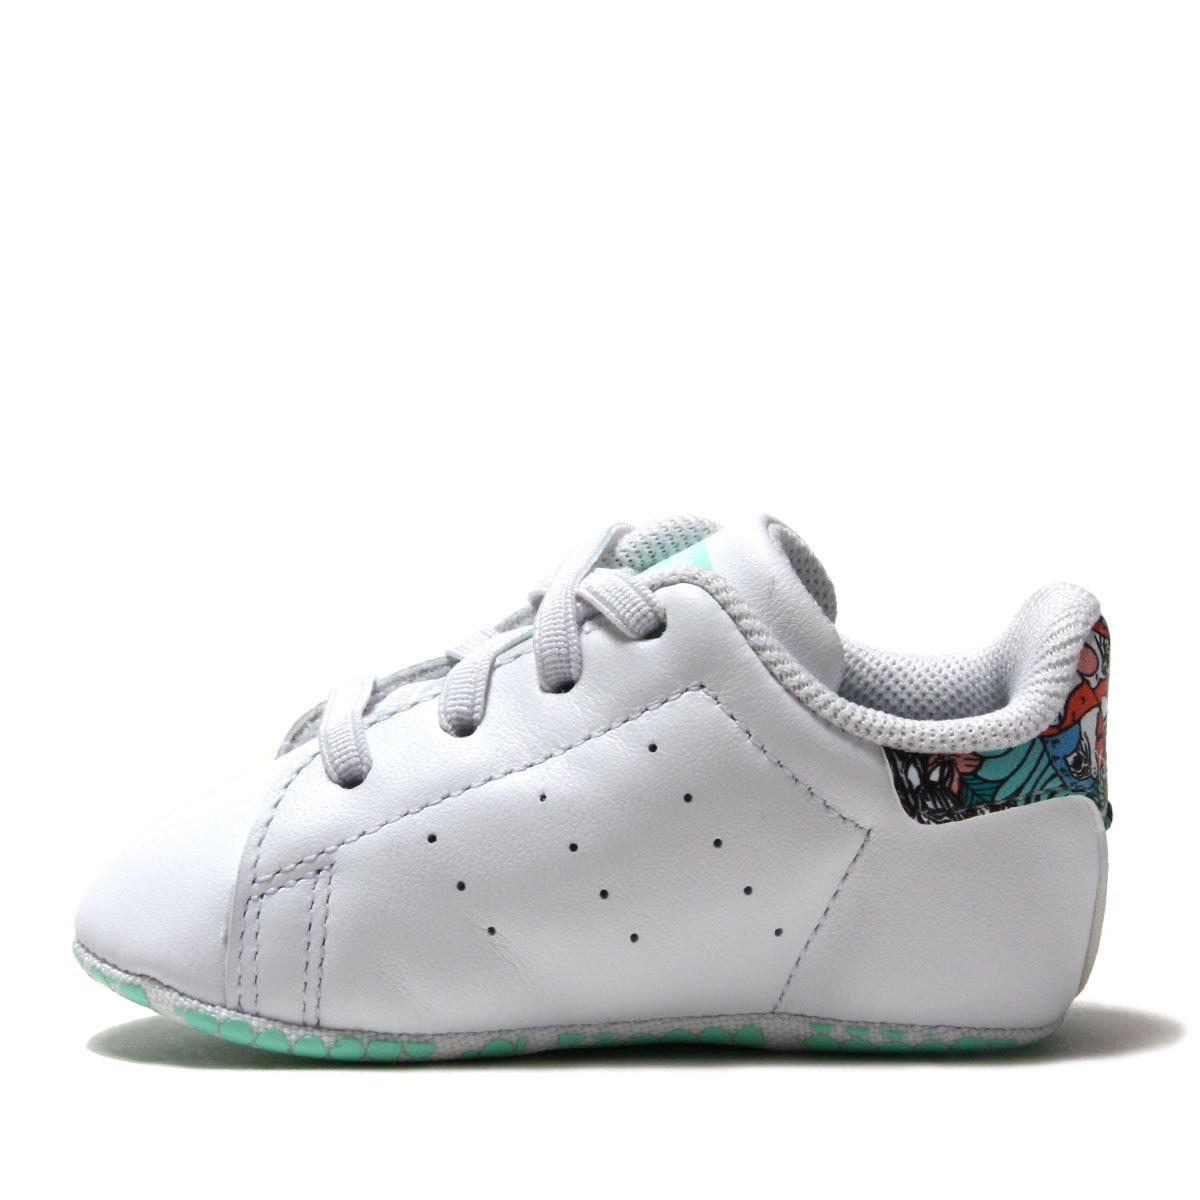 adidas Originals STAN SMITH CRIB (Adidas originals Stan Smith CRIB) Running WhiteClear MintClear Mint 18FW I